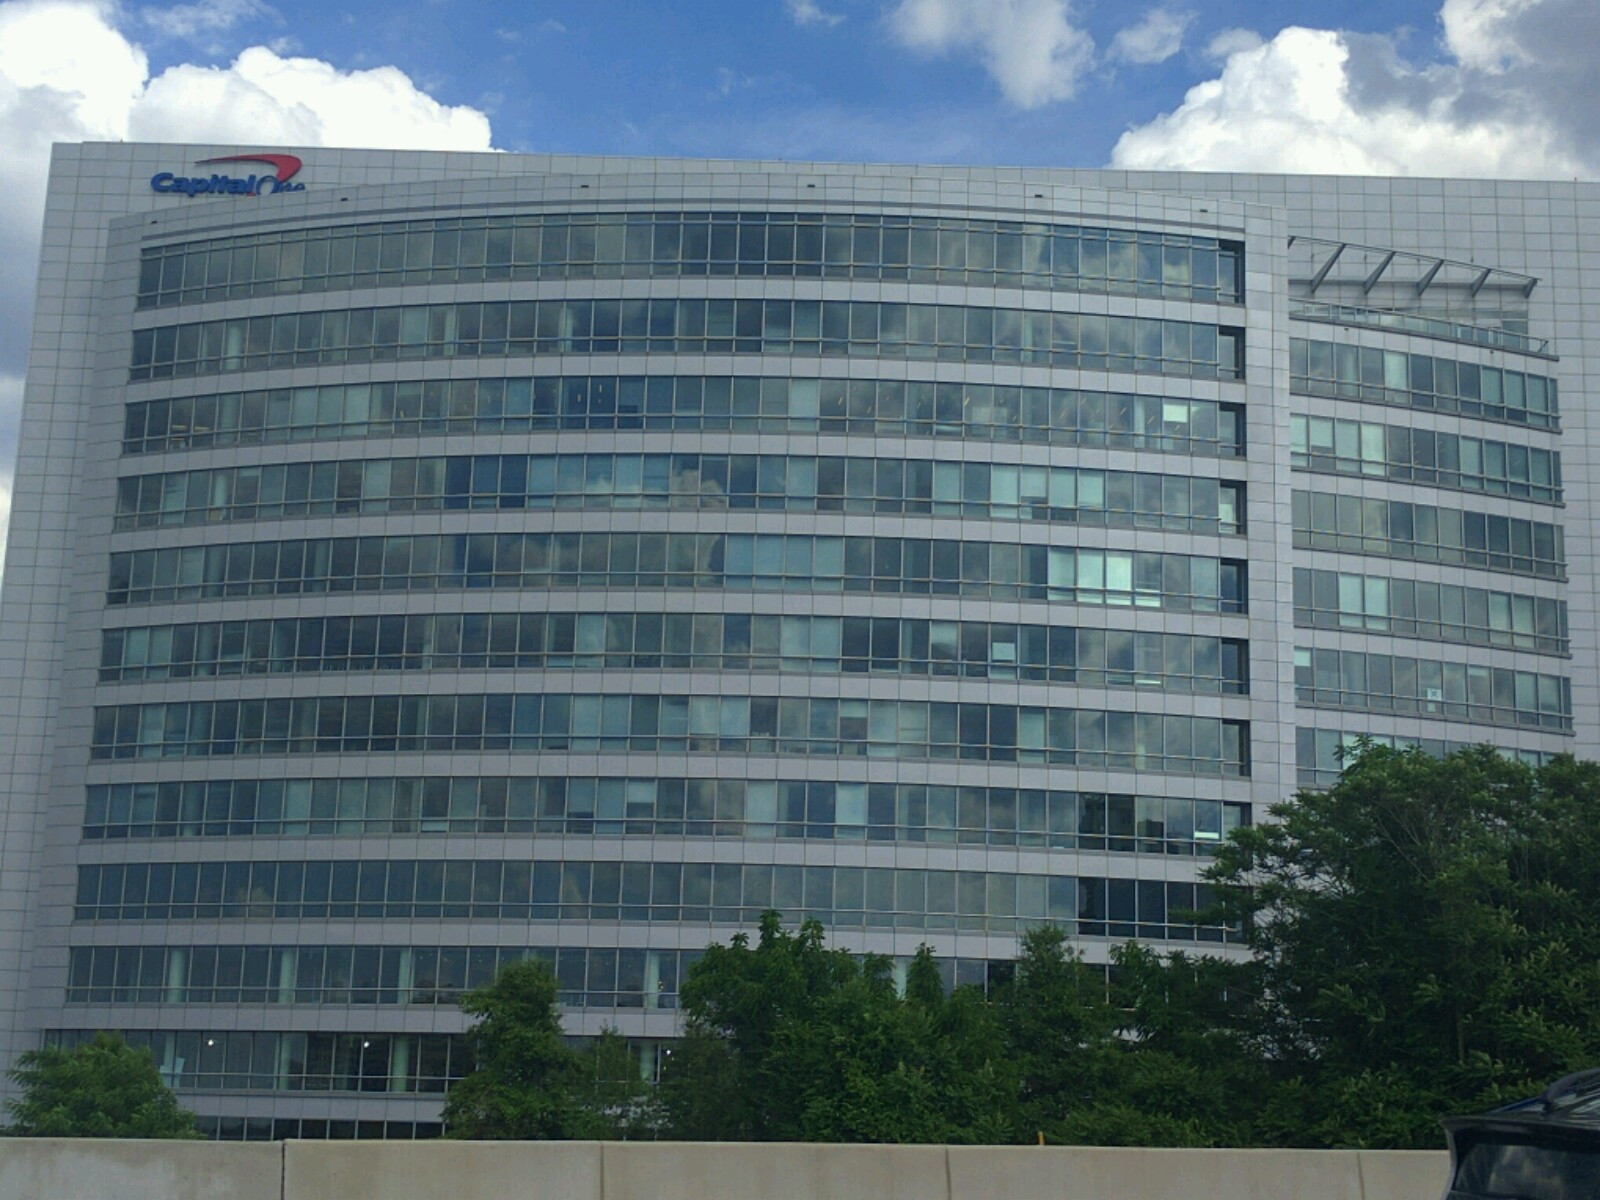 Capital One's headquarters in McLean, Virginia.